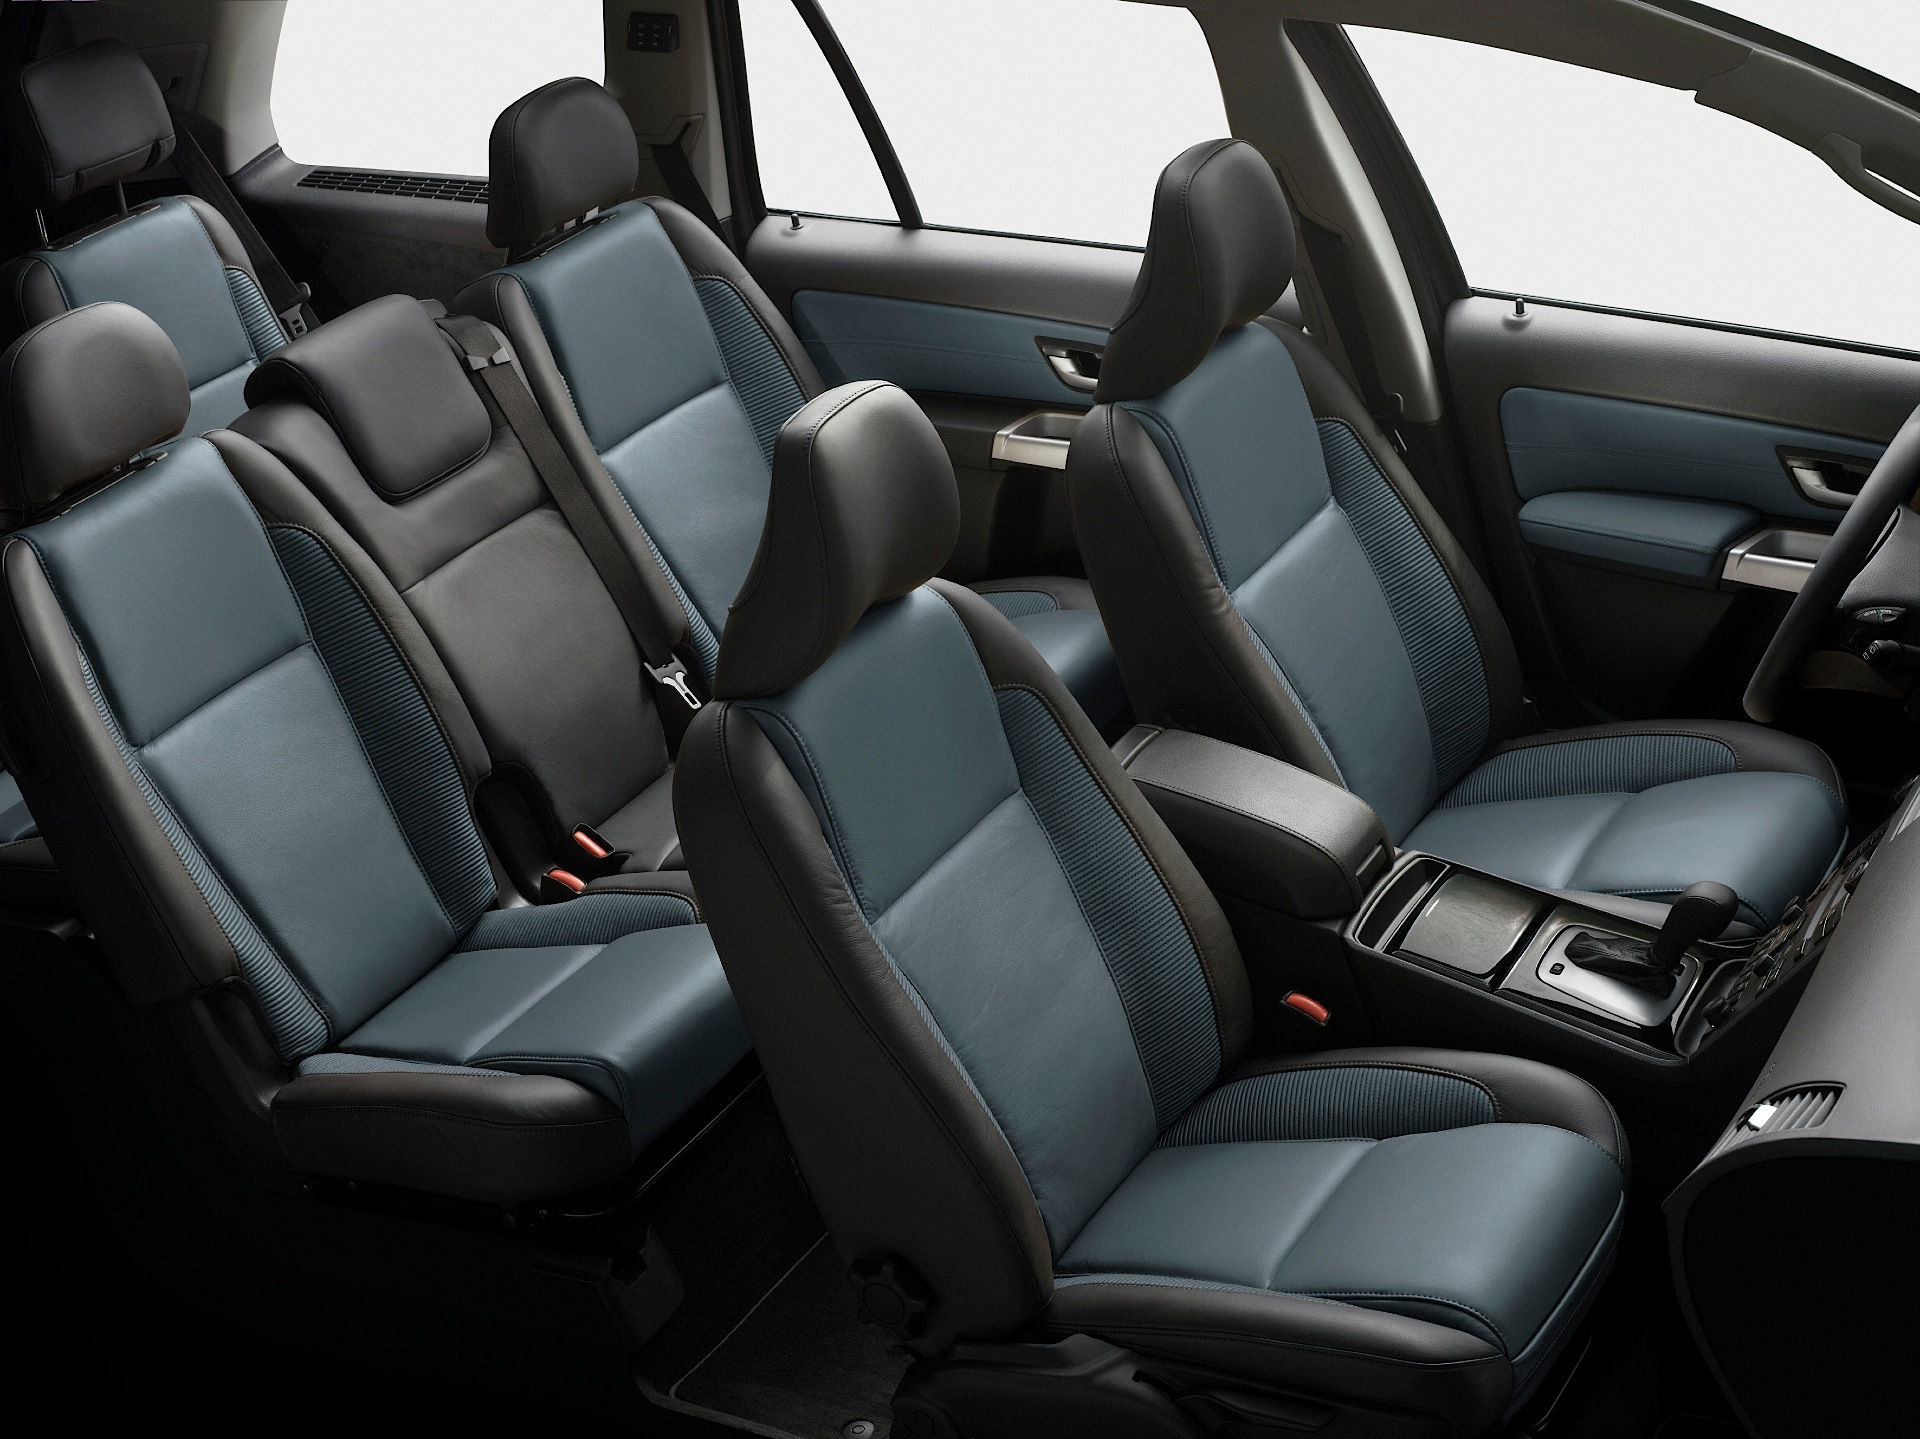 2005 Volvo Xc90 2.5 T Awd >> VOLVO XC90 - 2002, 2003, 2004, 2005, 2006 - autoevolution